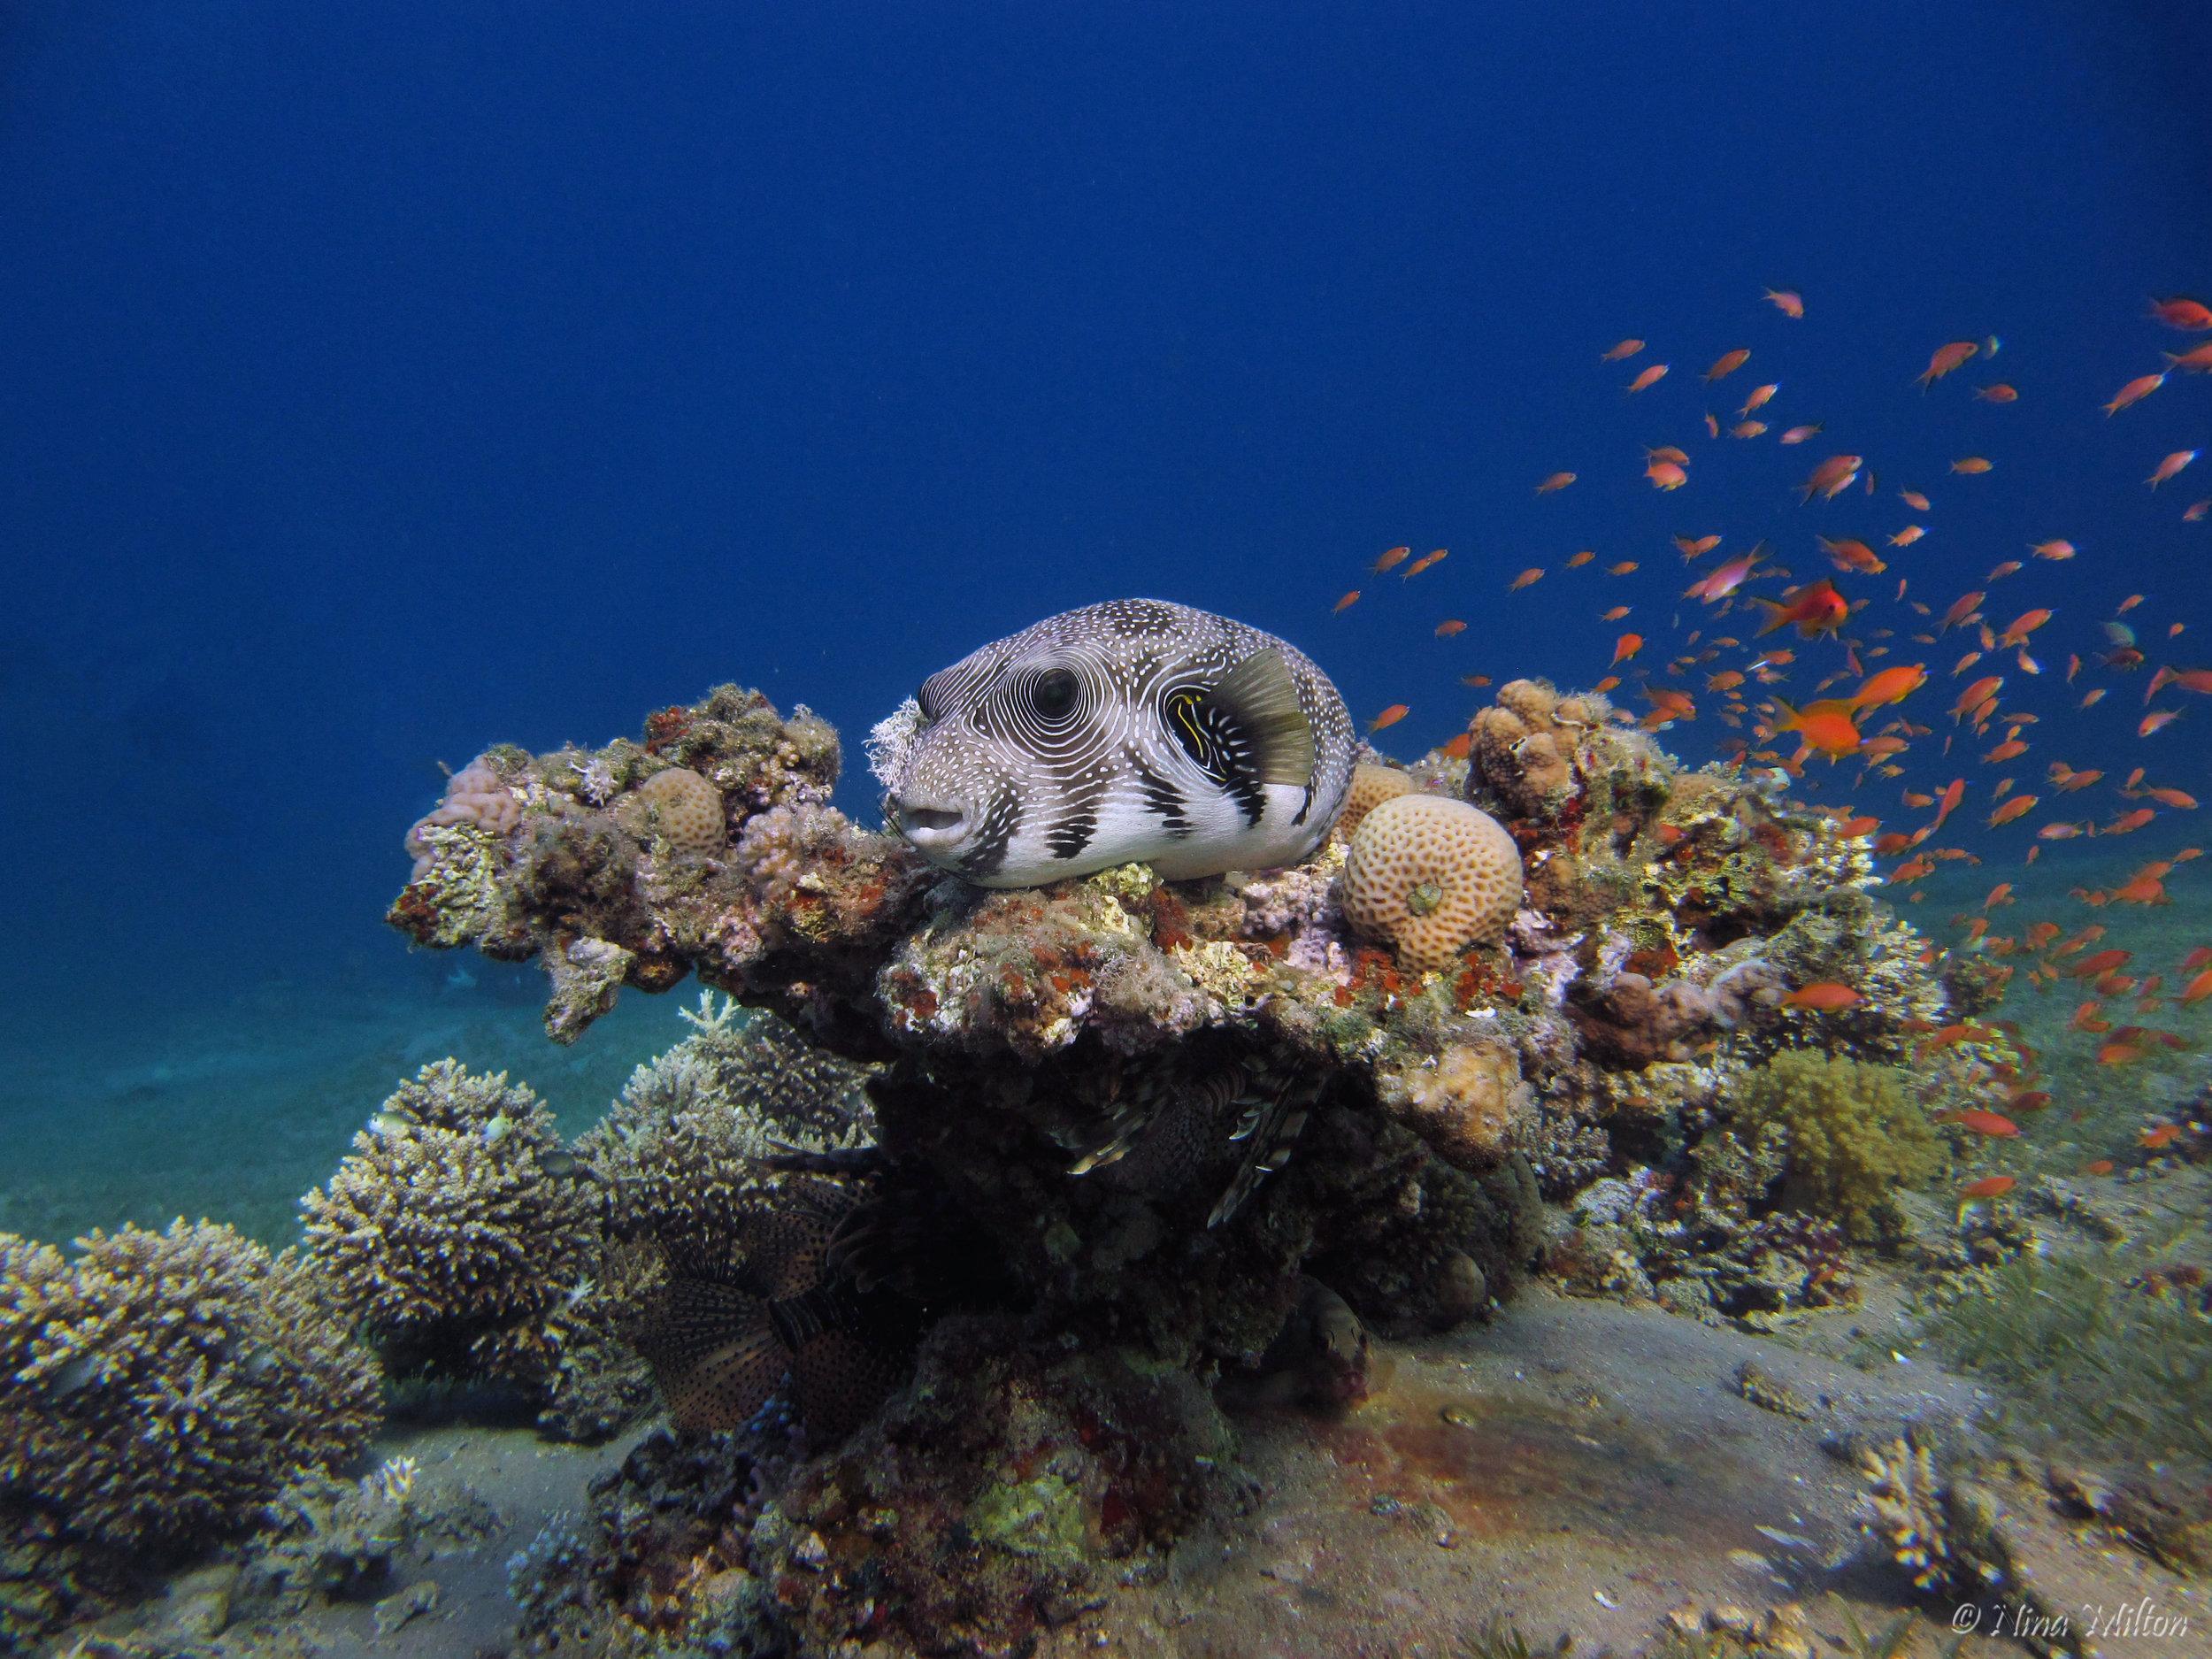 Dahab_diving_Red Sea_Egypt_Sinai_fish_3.JPG